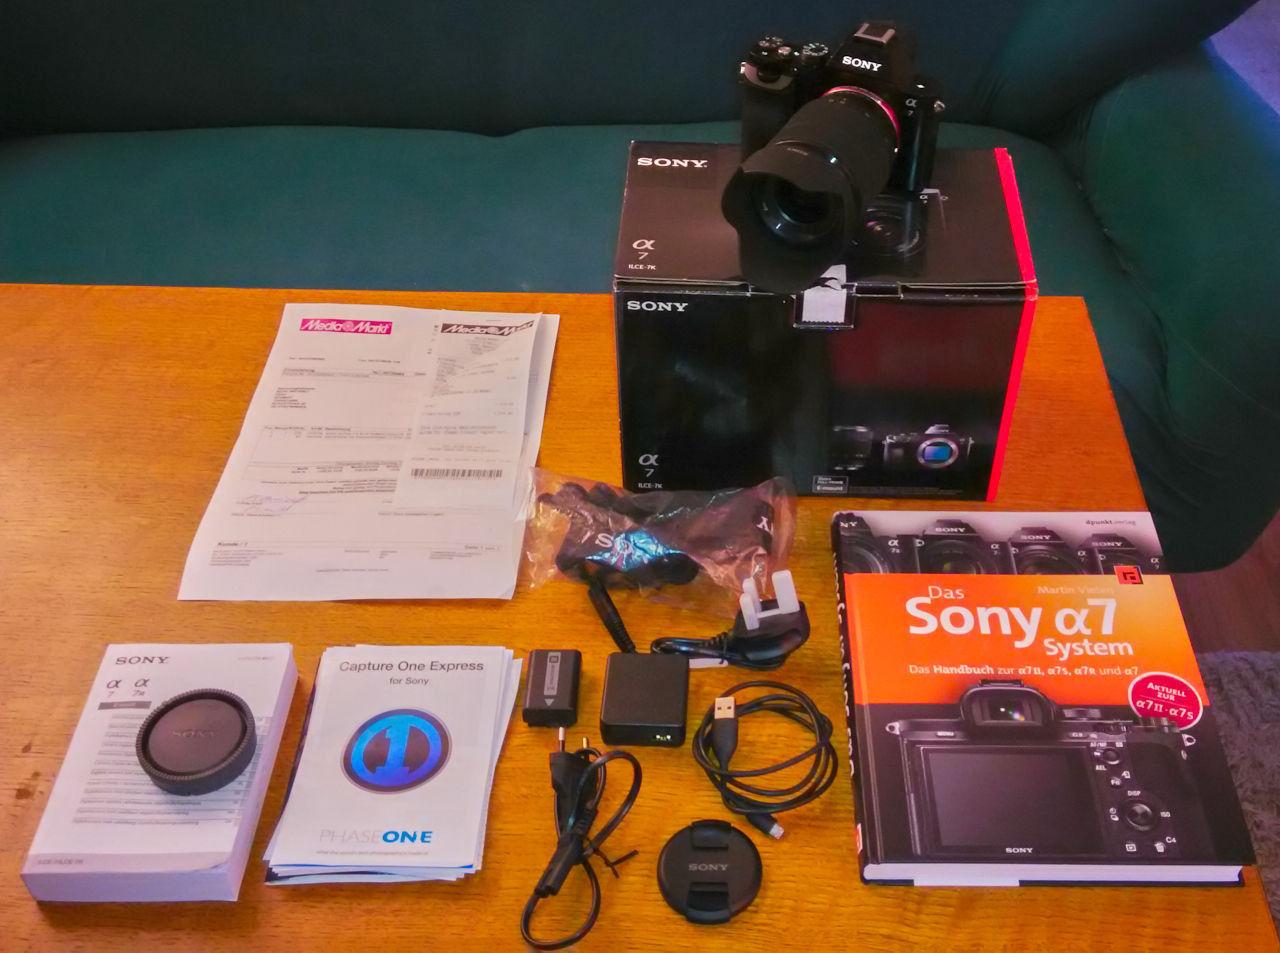 Sony Alpha A7 ILCE-7K+FE 28-70mm f/3.5-5.6, OSS, OVP, 4 Monate alt, Kaufbeleg